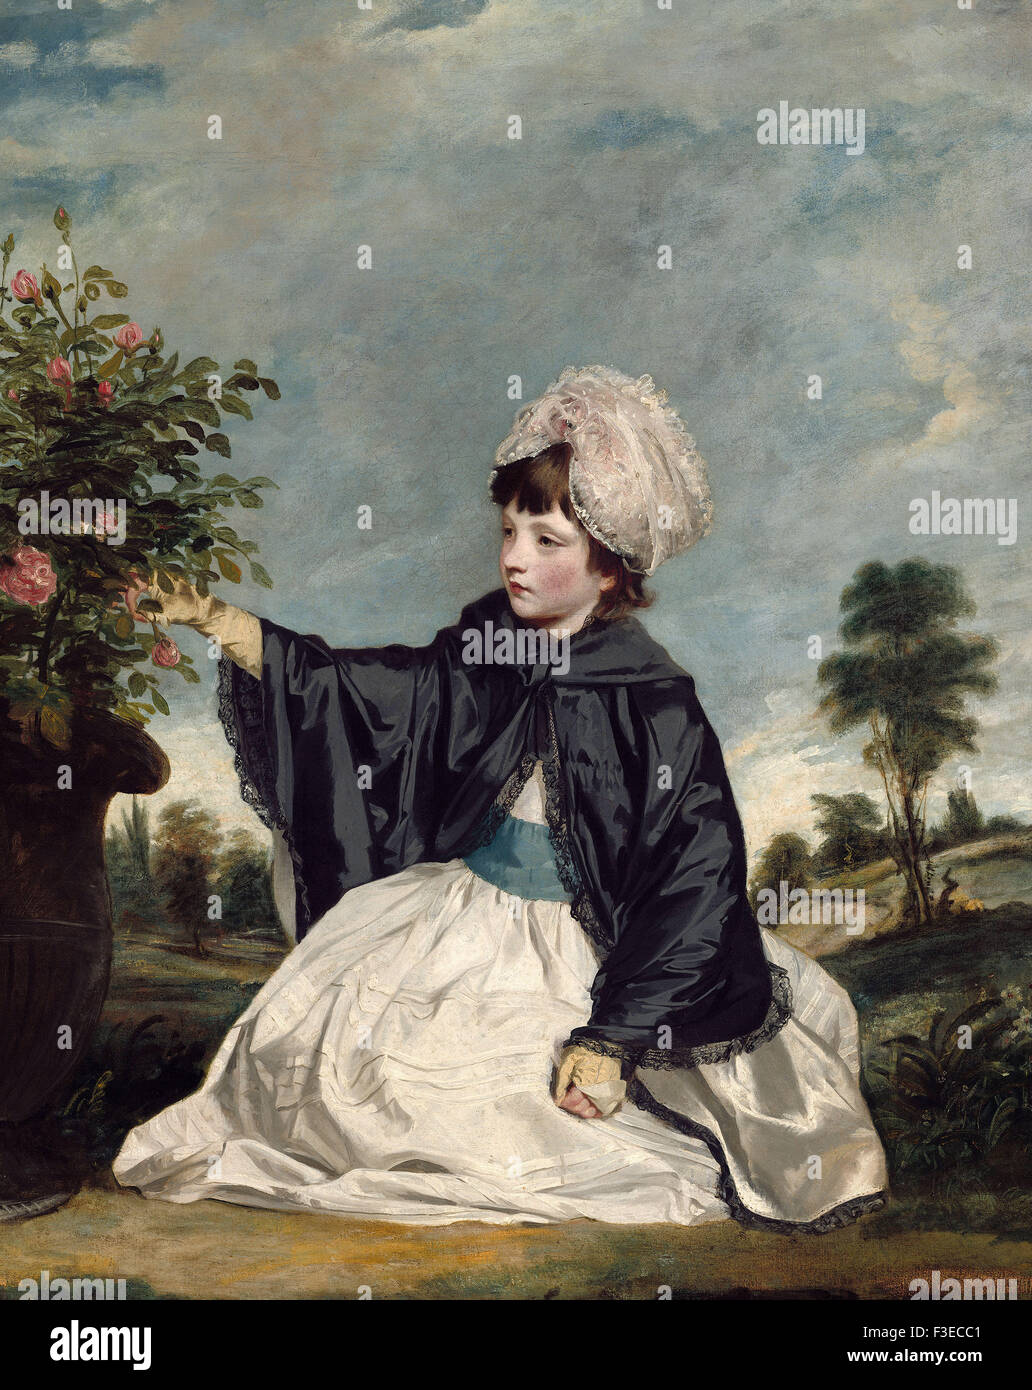 Sir Joshua Reynolds - Lady Caroline Howard - Stock Image